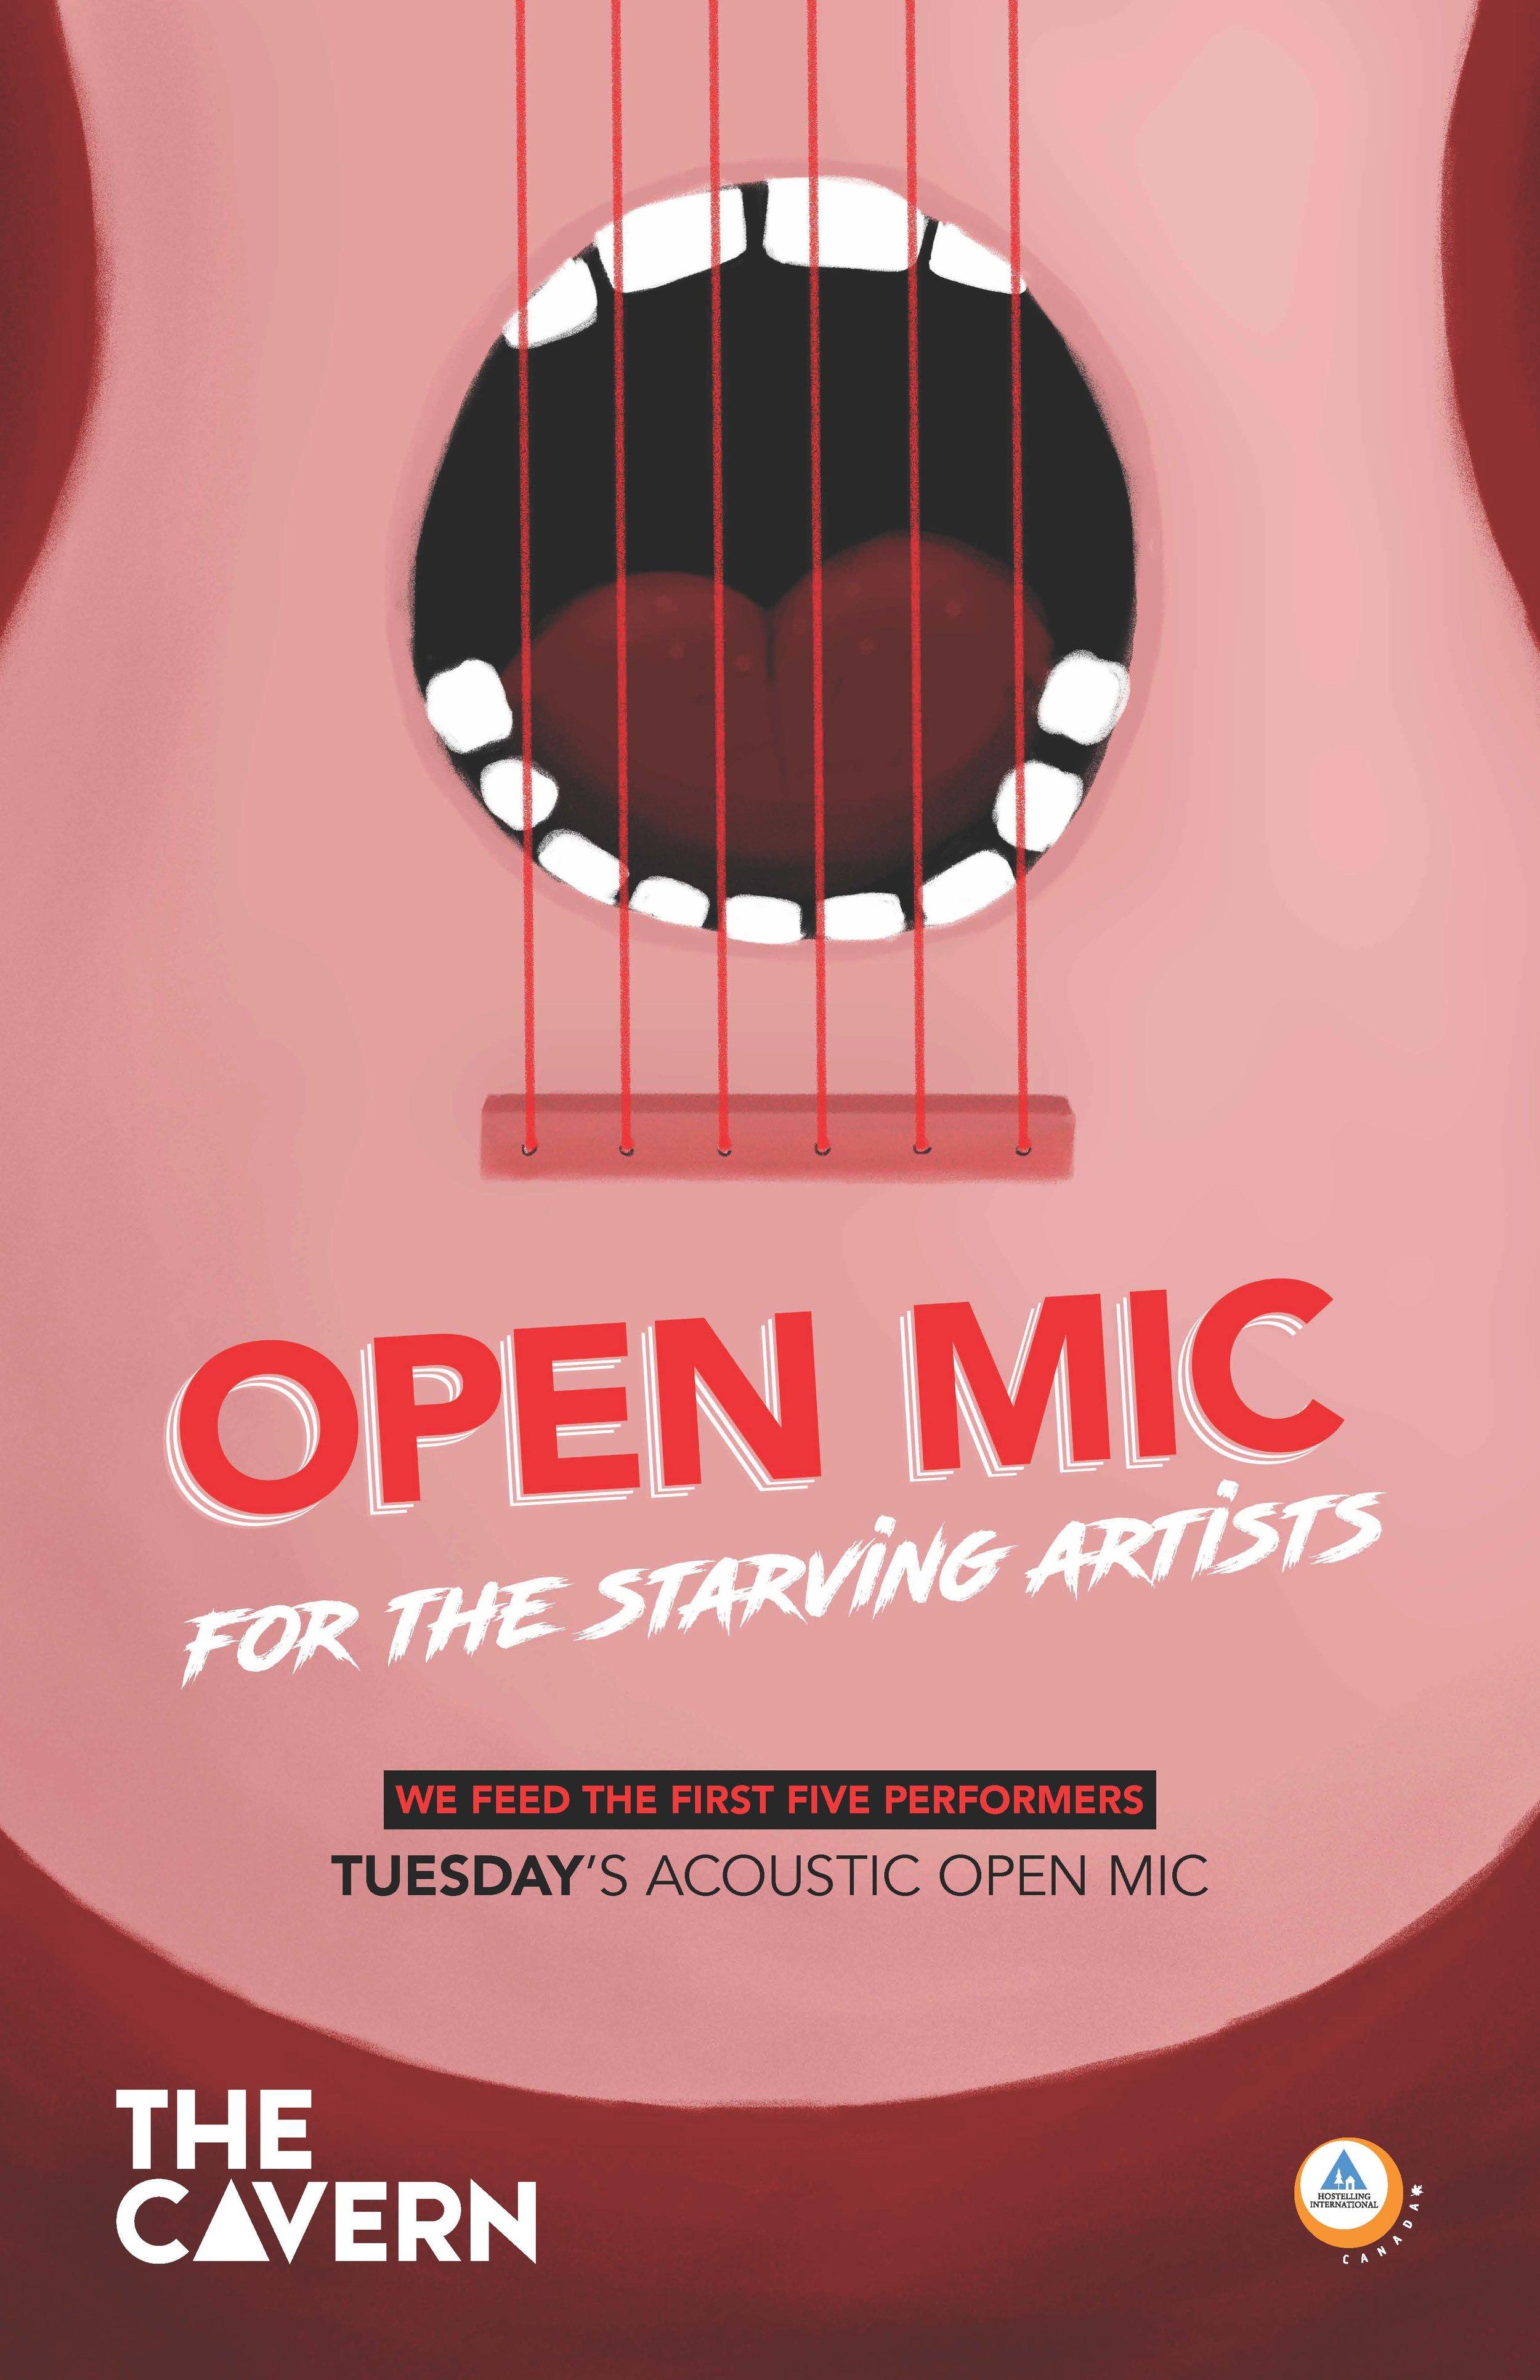 Acoustic Open Mic at The Cavern, HI-Toronto